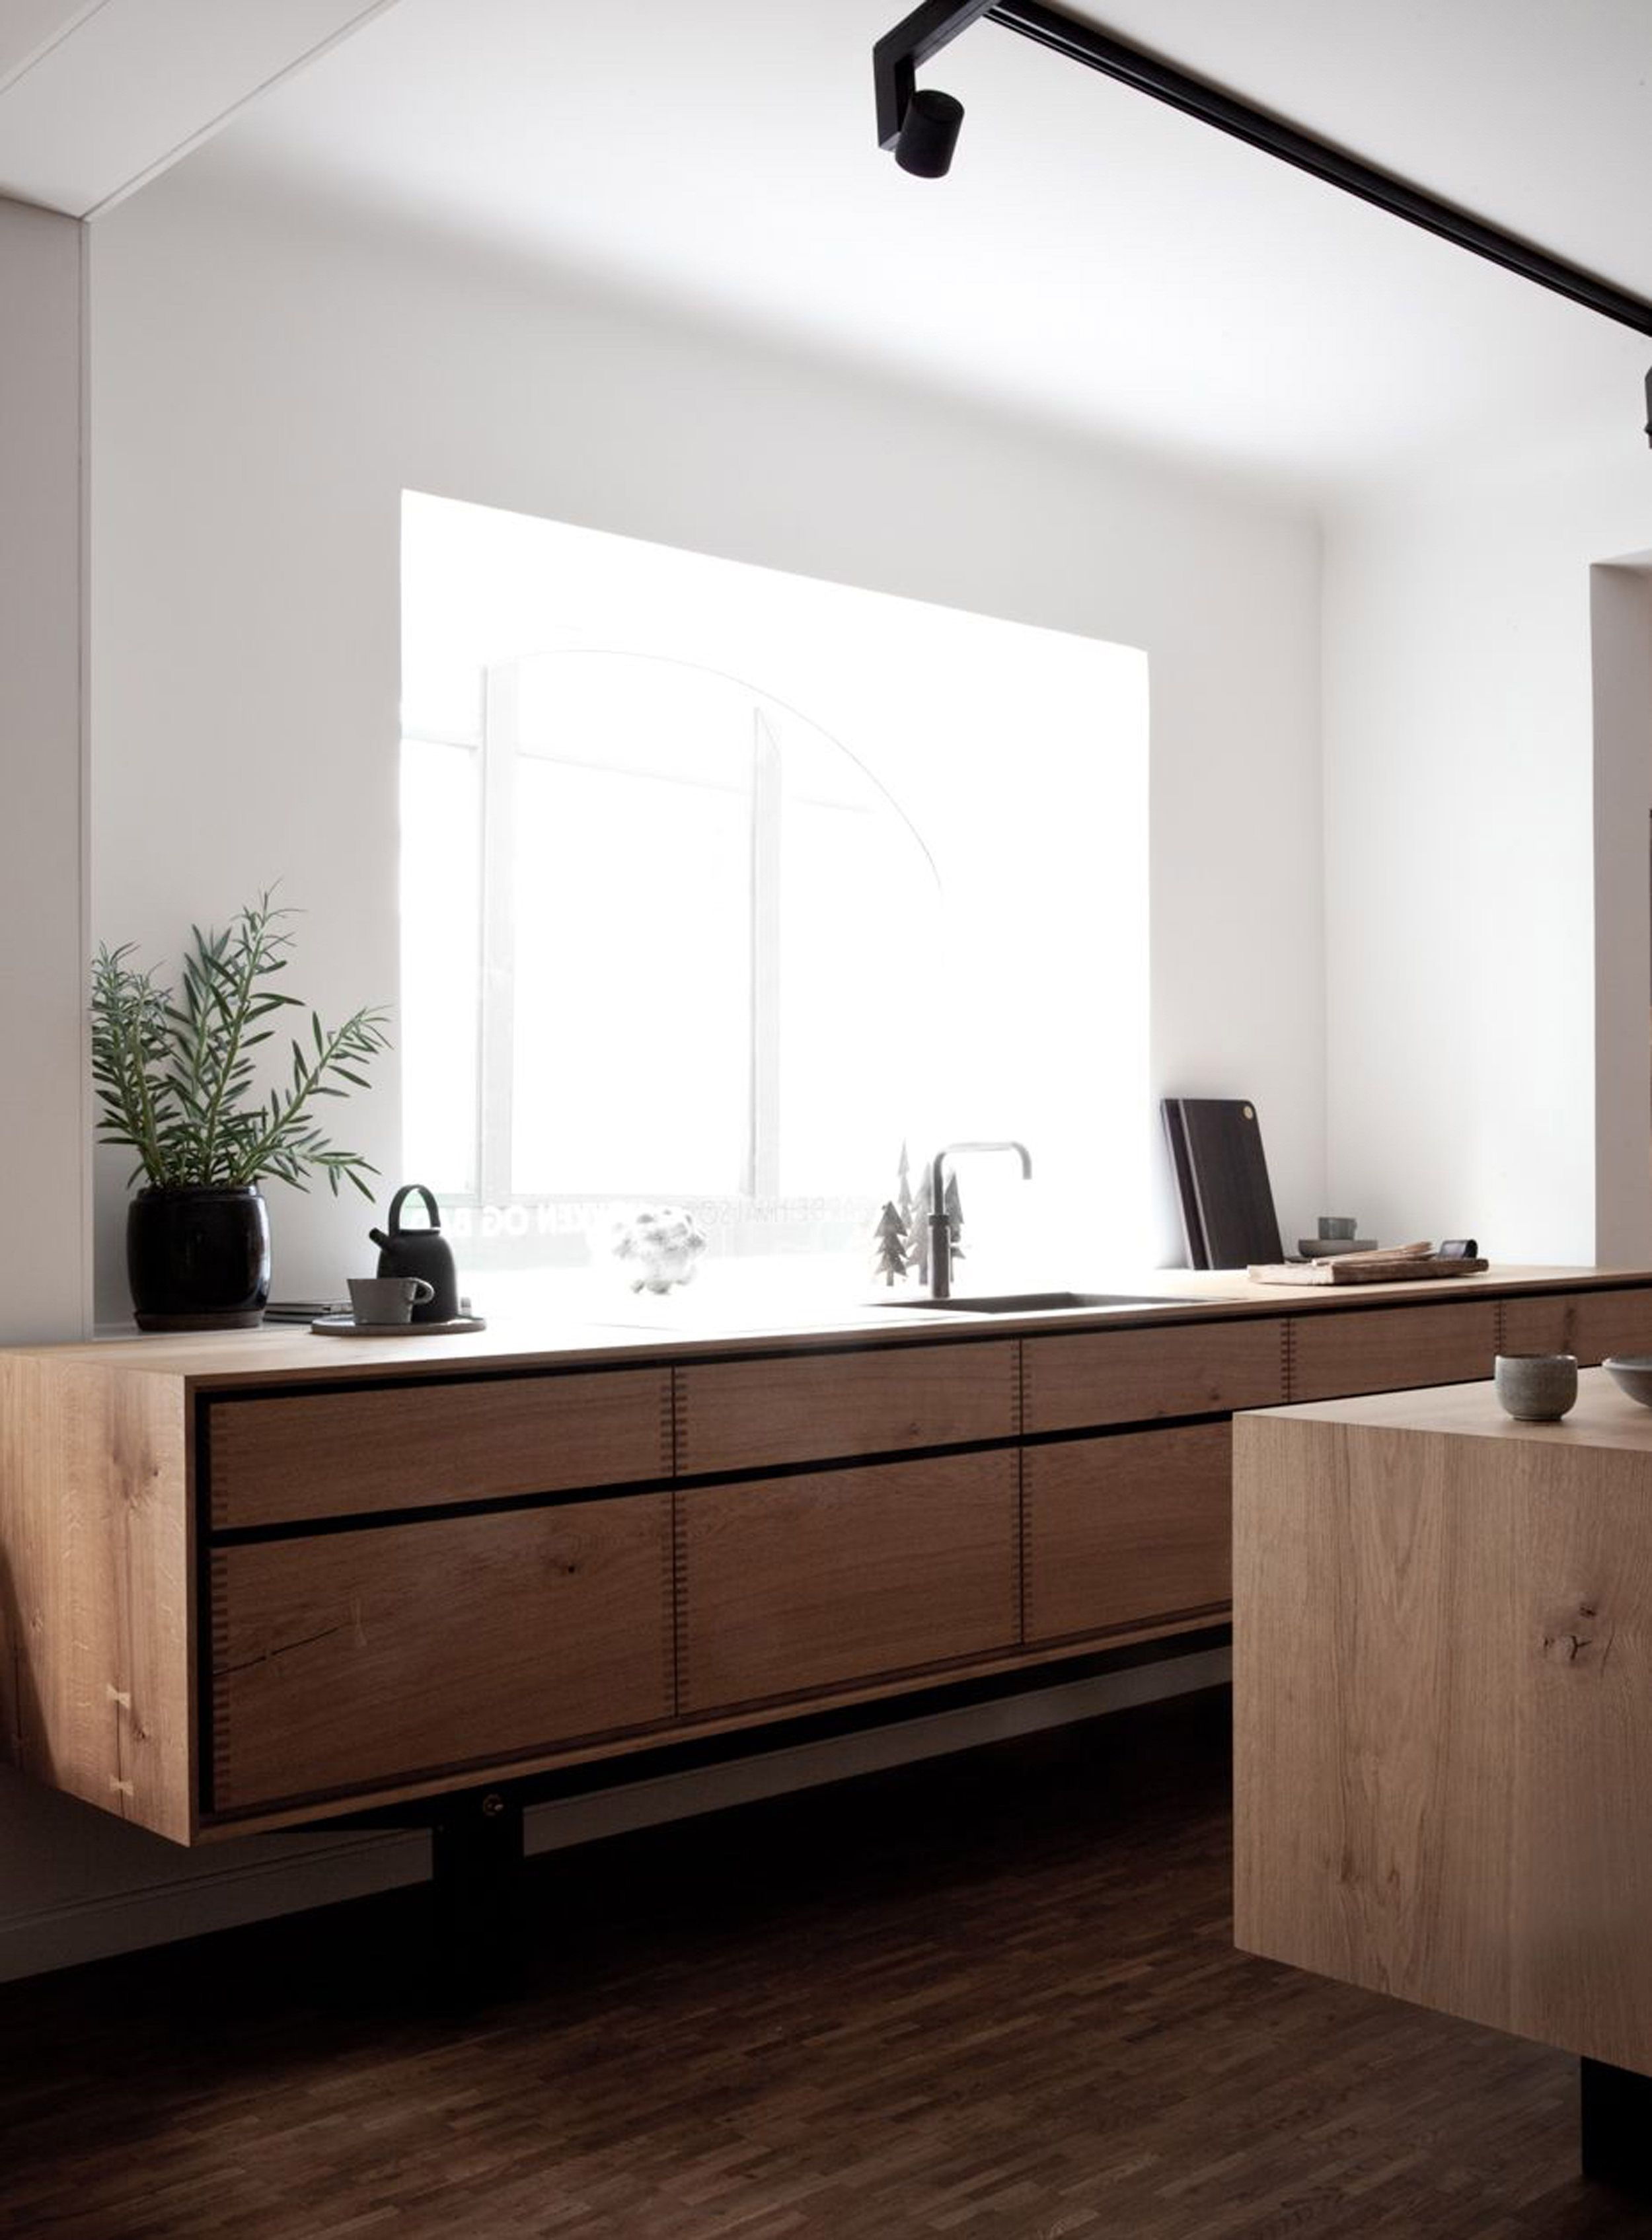 Küchendesign neu minimalist living room boho window minimalist living room minimalism